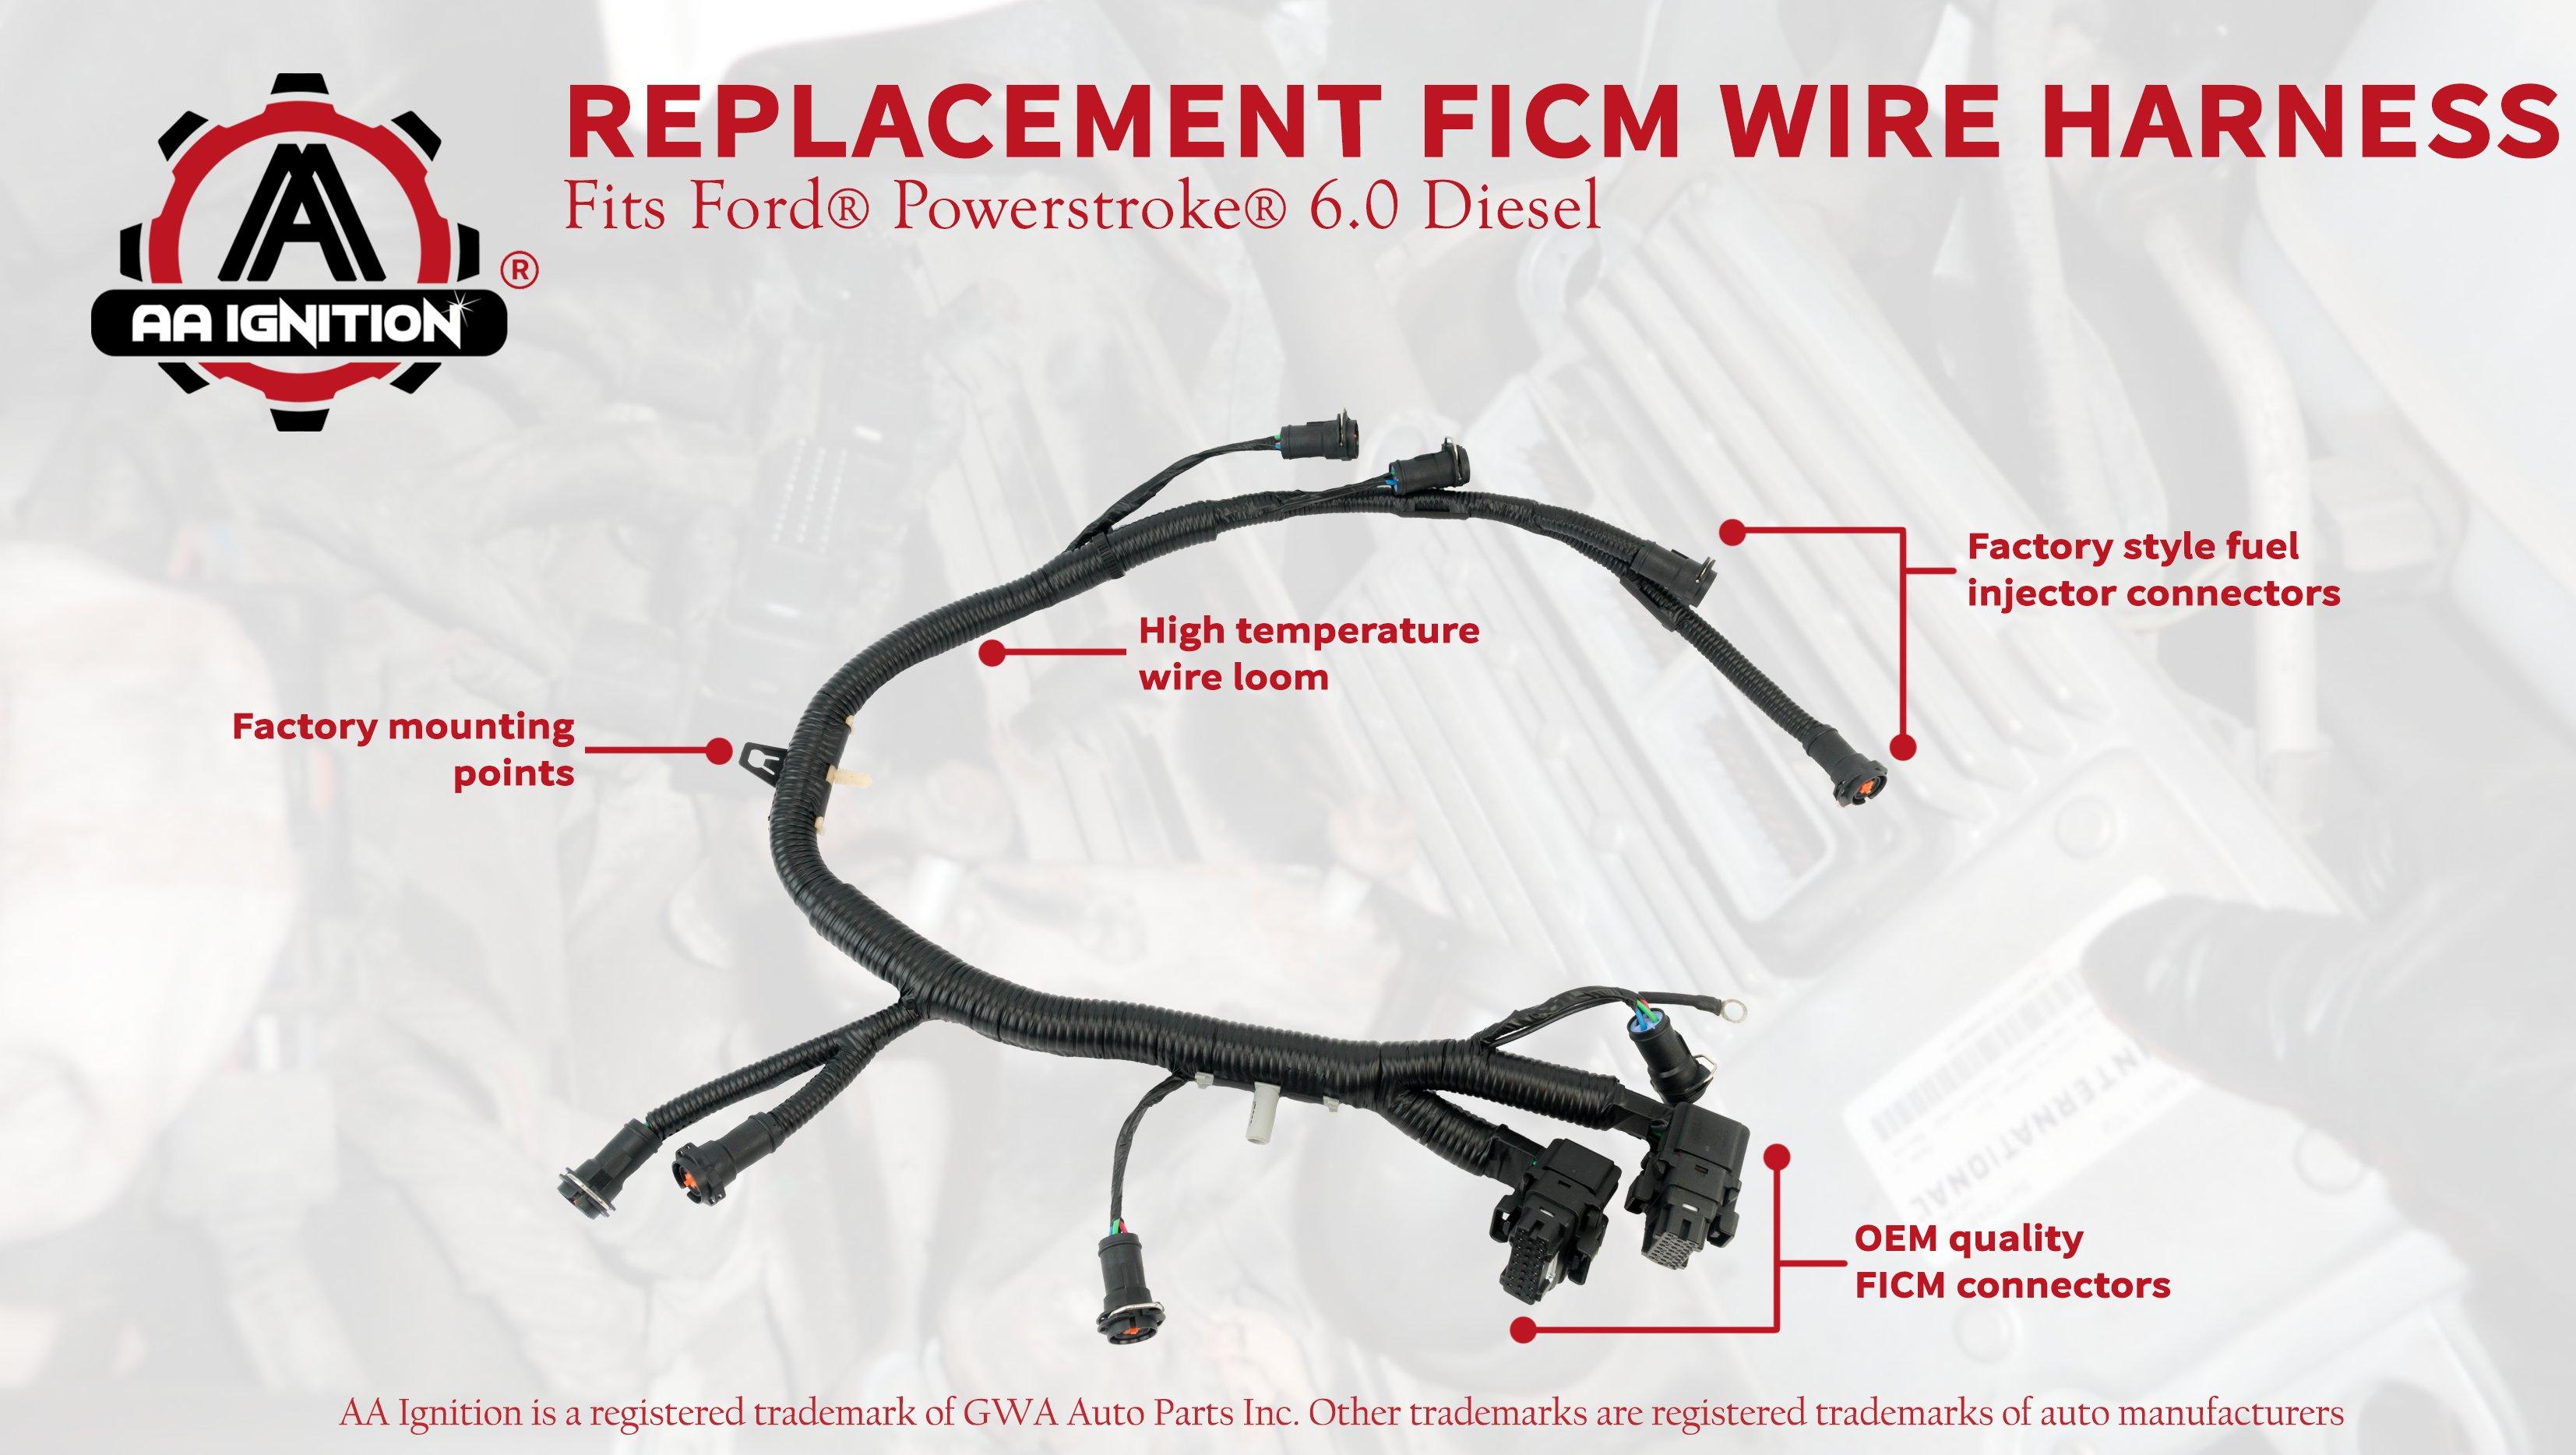 Tz 8945 6 0 Powerstroke Wiring Harness Diagram Download Diagram